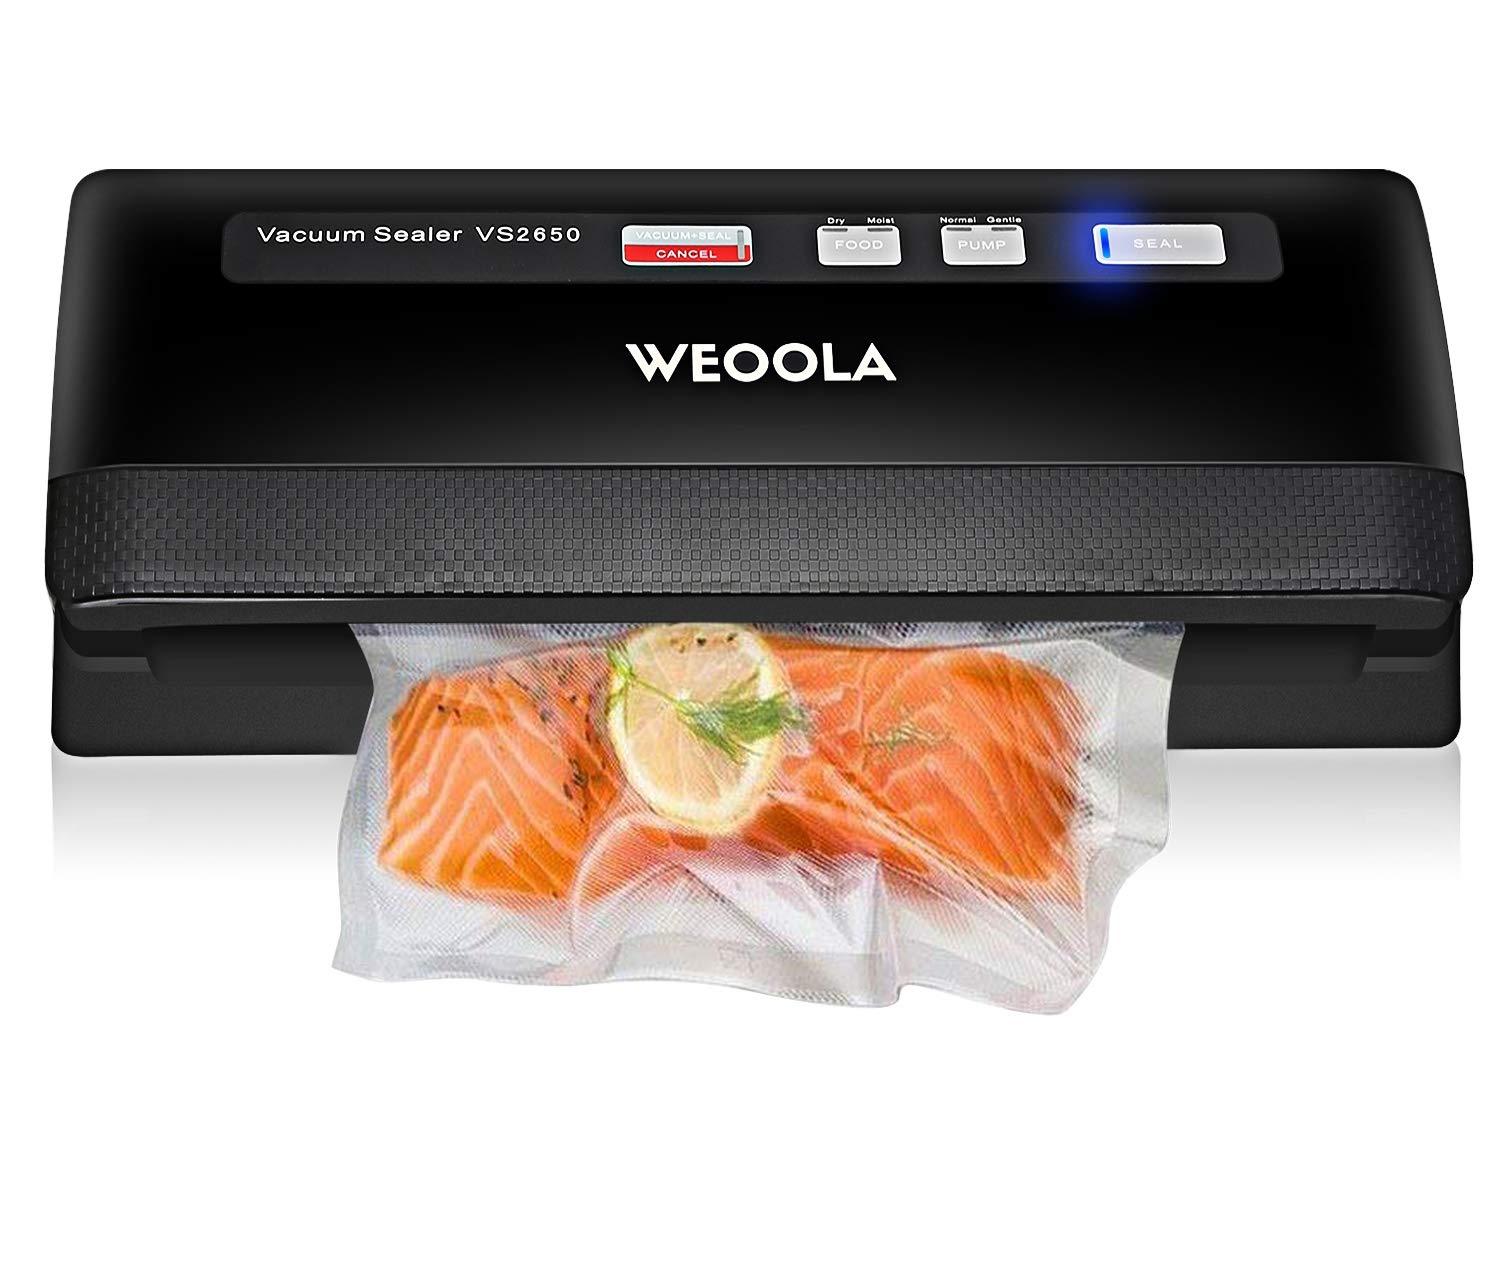 WEOOLA Vacuum Sealer Machine Foodsaver Vacuum Sealing System,Automatic Food Sealer Vacuum Packing Machine for Food Preservation,Sous Vide and Mason Jar 3 Sealing Options 4 Food Modes 10 Sealer Bags